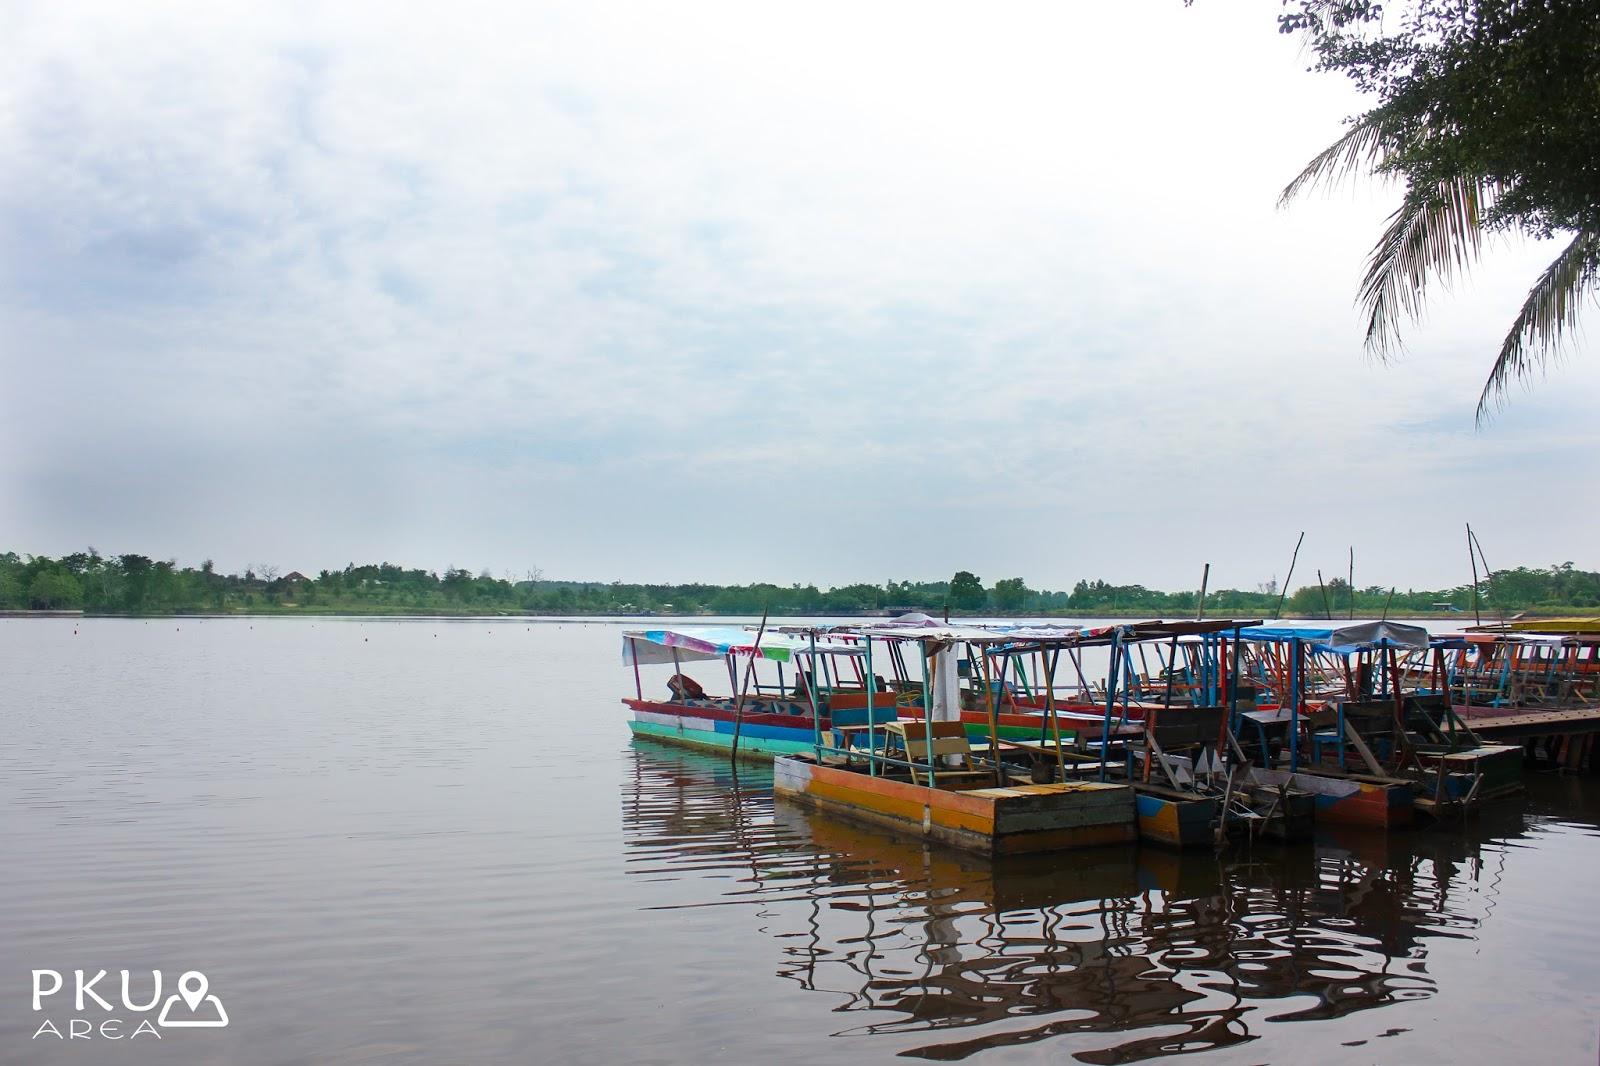 Situs Cagar Budaya Rumah Singgah Tuan Kadi Pekanbaru Area Wisata